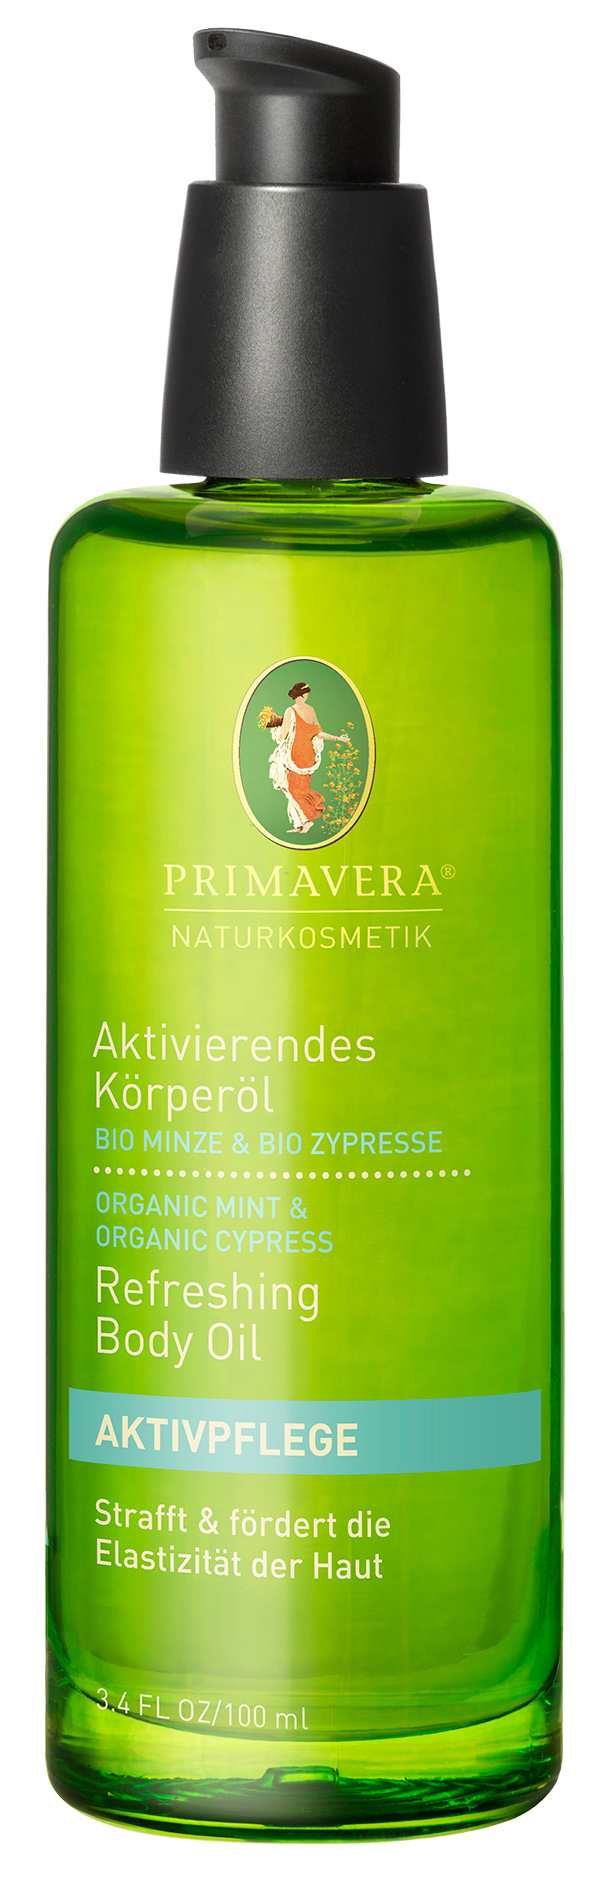 Aktivierendes Körperöl Minze Zypresse, 100 ml